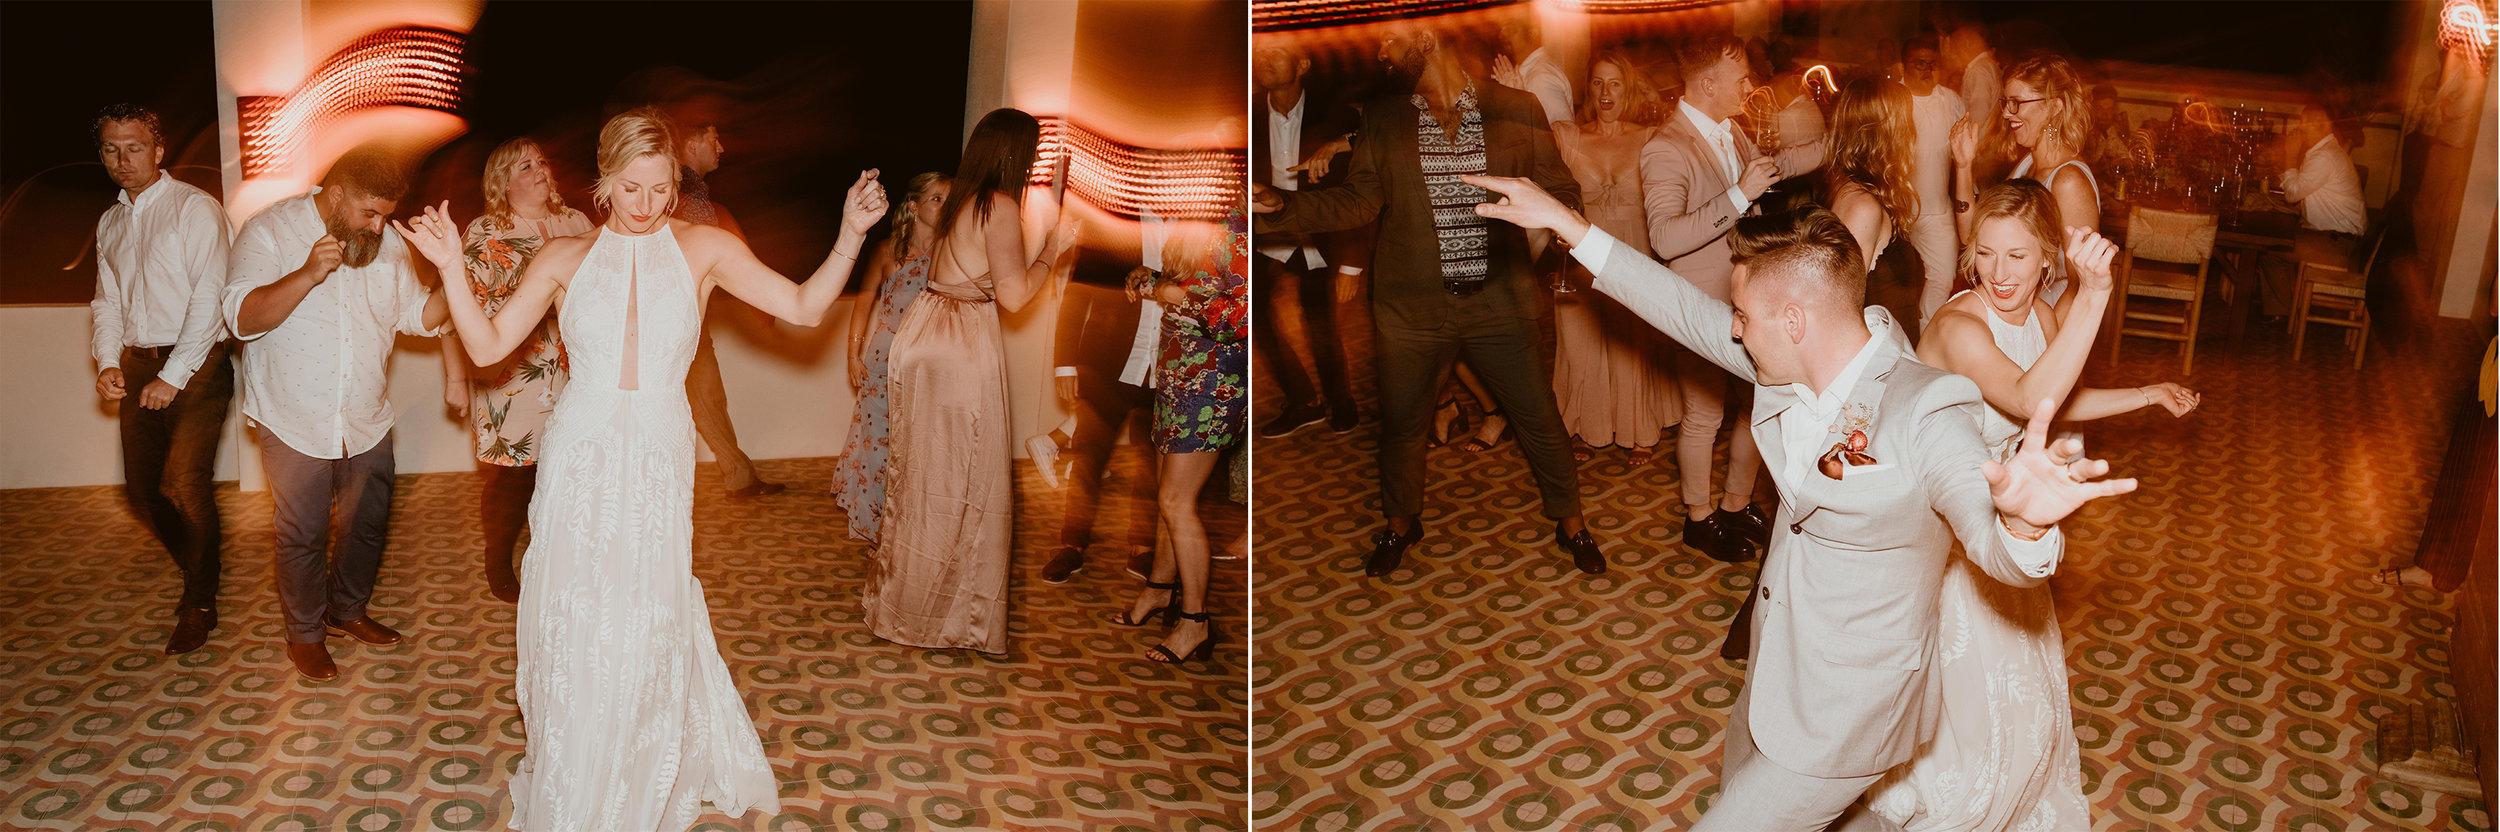 Lisa+Sam Hotel San Cristobal Wedding -556.jpg